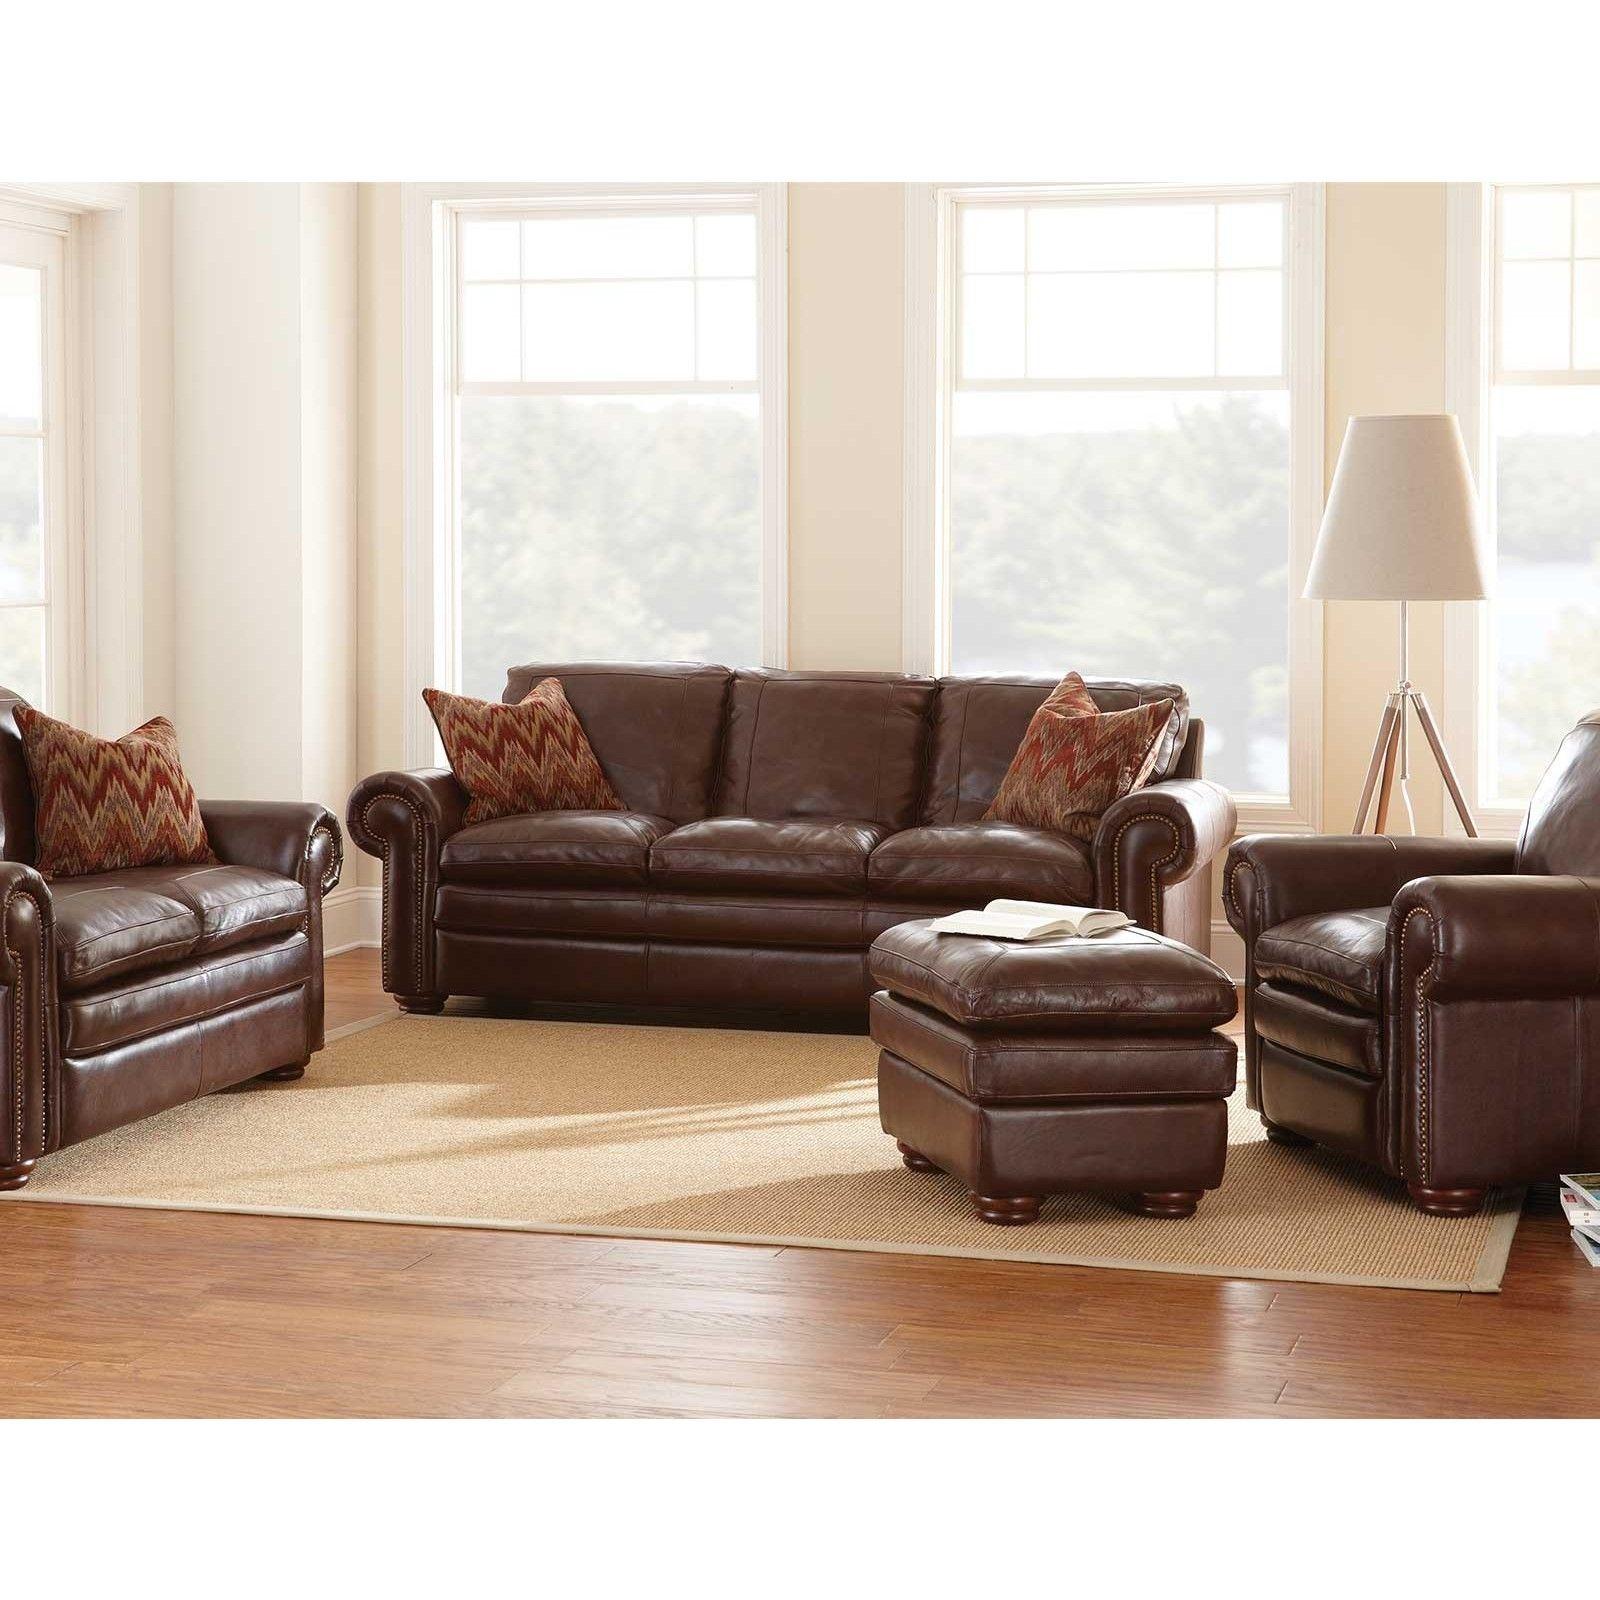 Furniture Living Room Dark Brown Full Grain Leather Sofa bined